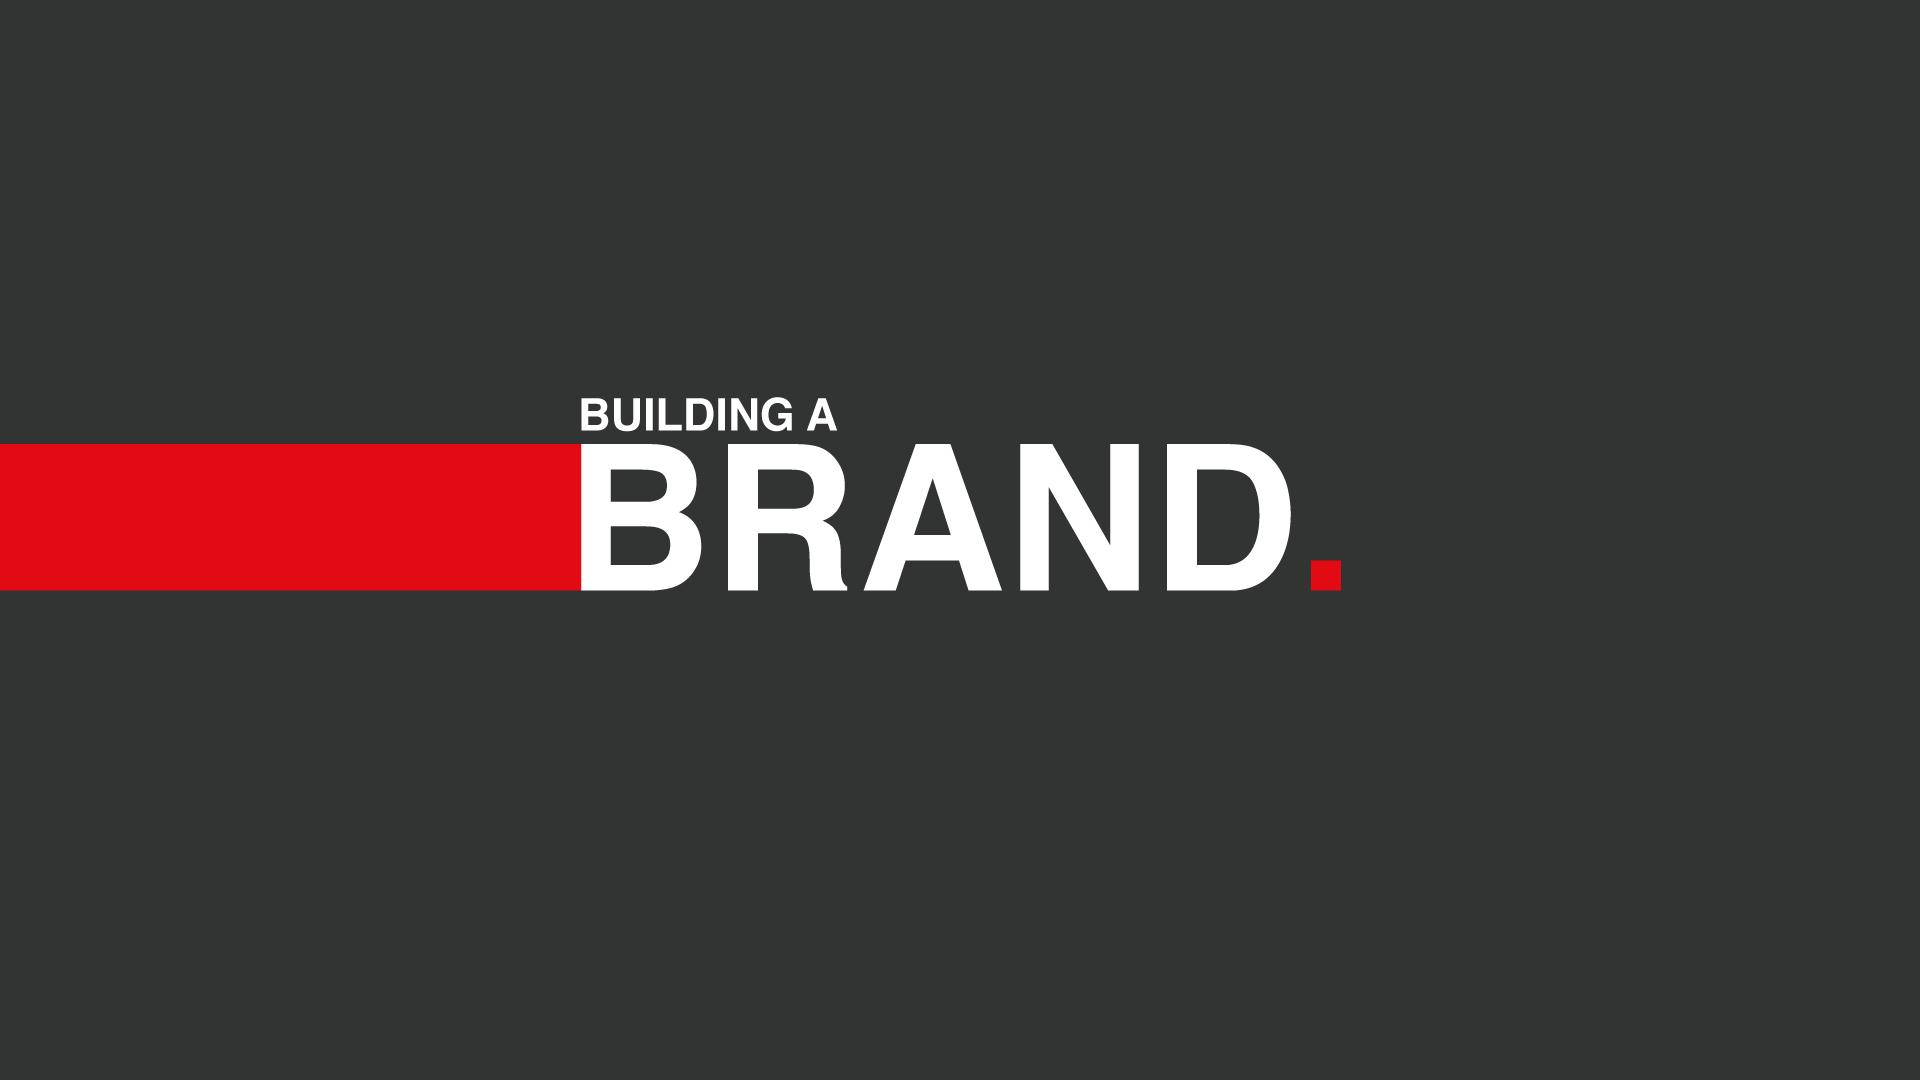 Building a Brand - Manraj Ubhi